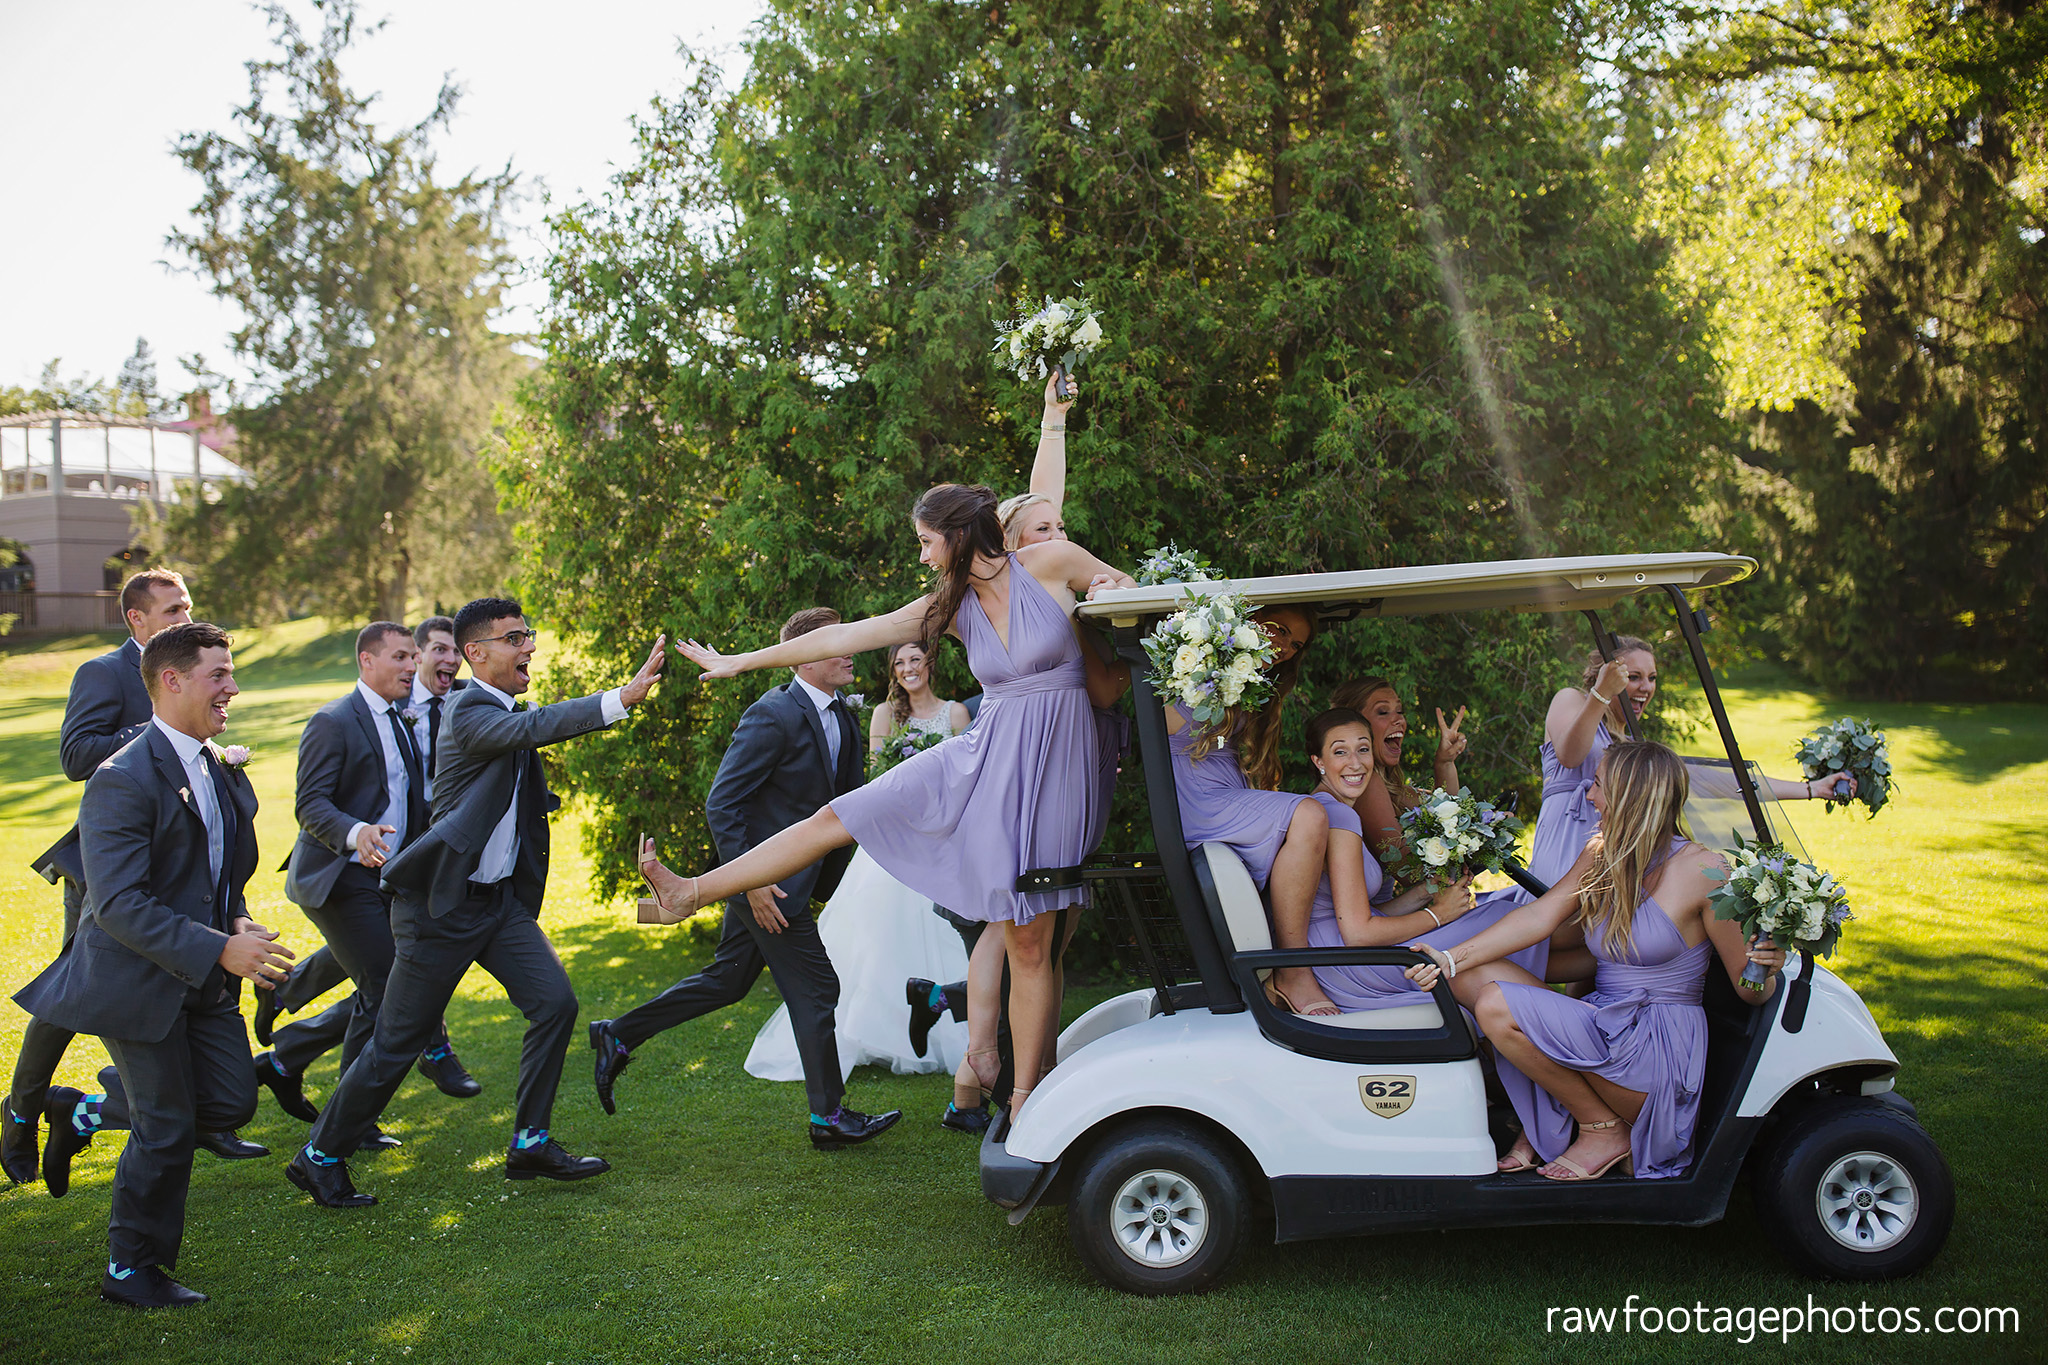 london_ontario_wedding_photographer-grand_bend_wedding_photographer-oakwood_resort_wedding-beach_wedding-sunset_wedding-raw_footage_photography042.jpg